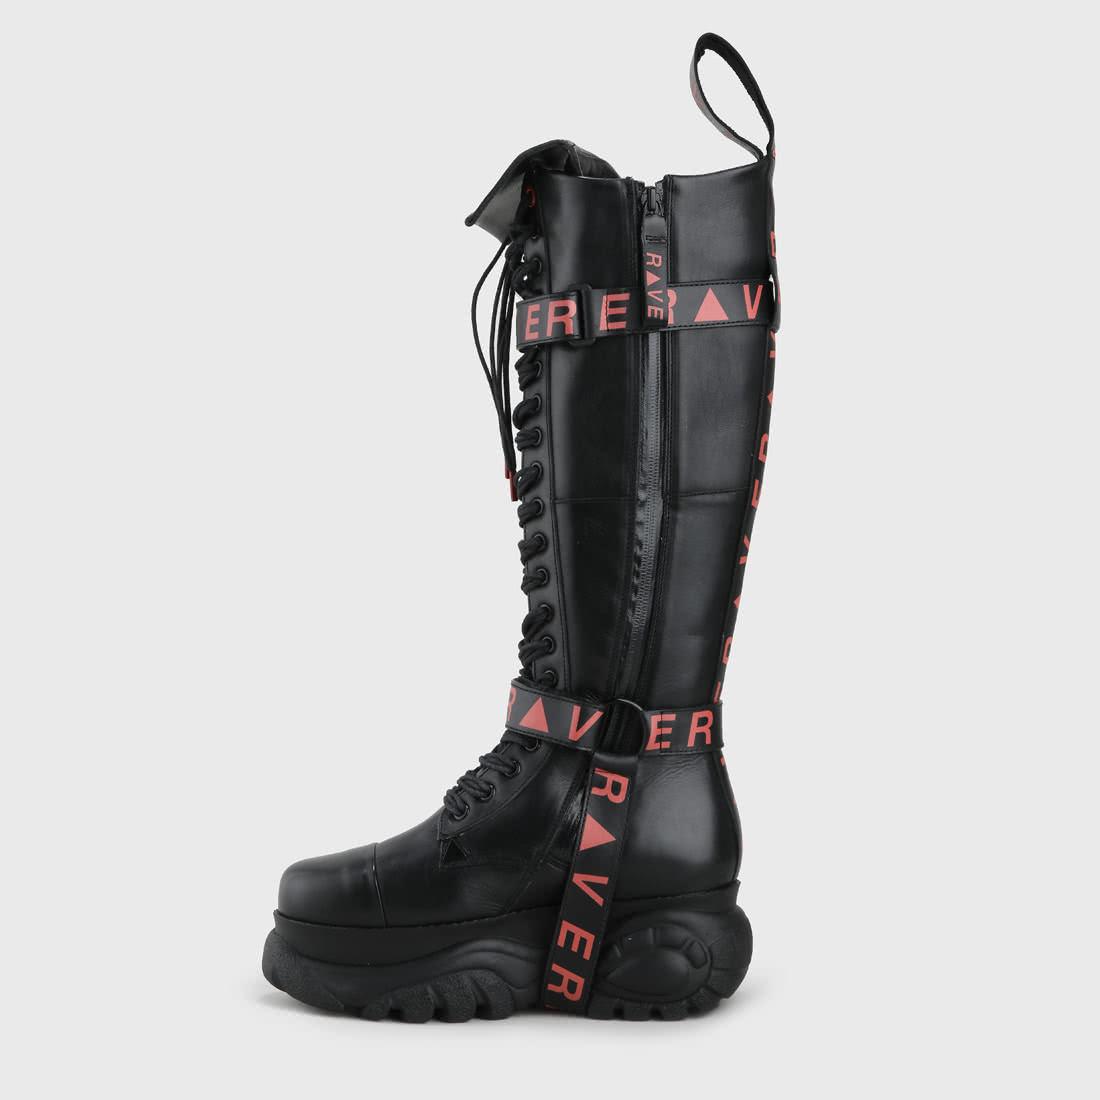 premium selection af44b e43cb Patrick Mohr x BUFFALO London Rave High aus Leder schwarz/rot